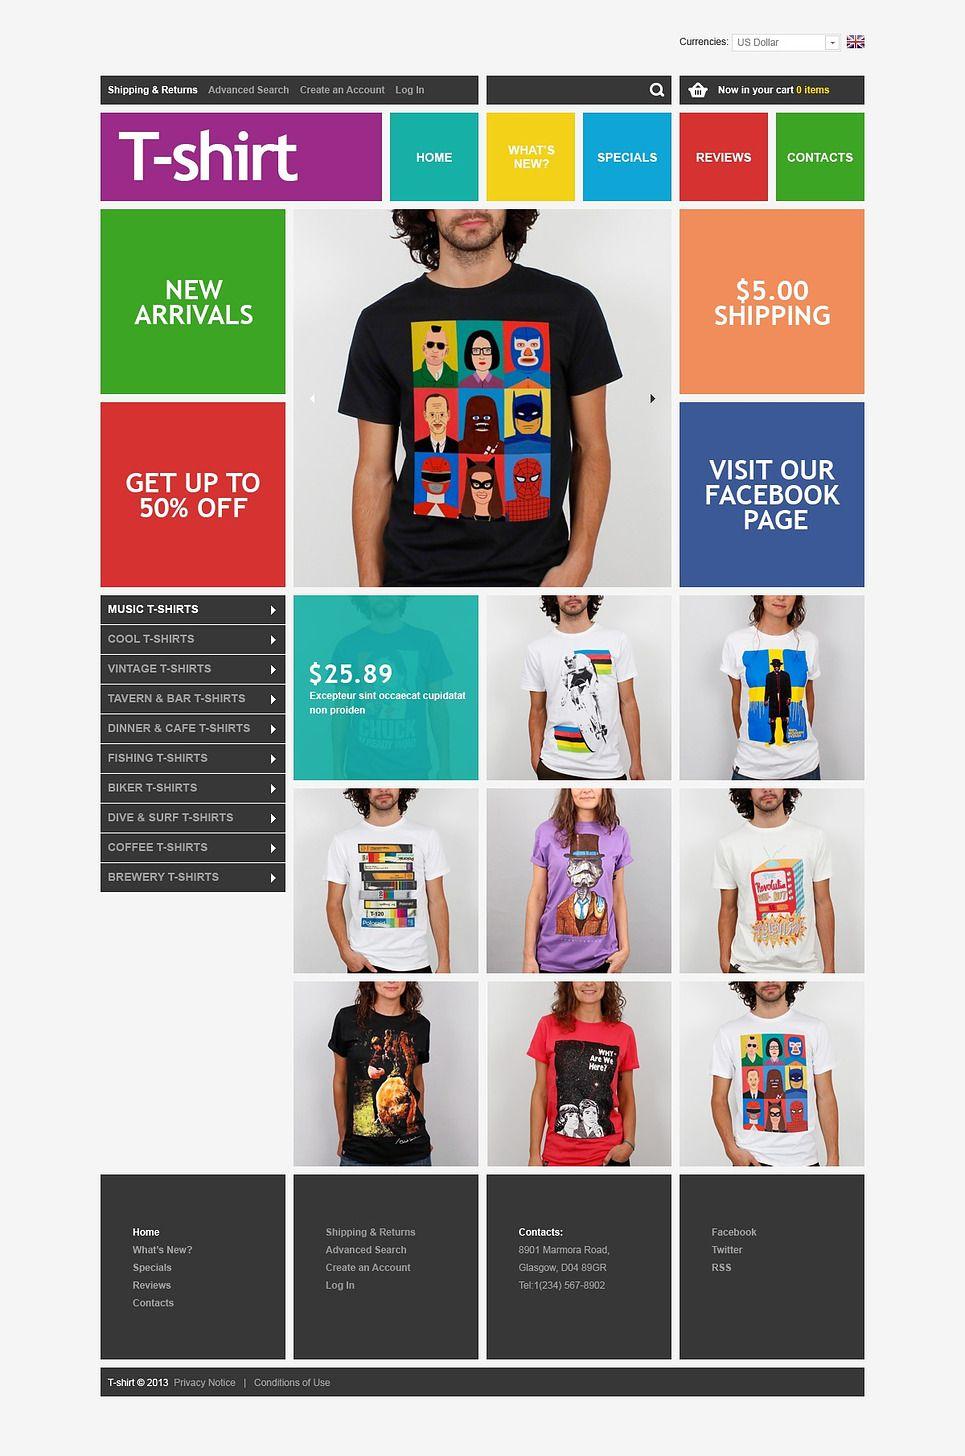 Image Result For Tshirt Website Template Tshirt Website Template - T shirt design website template